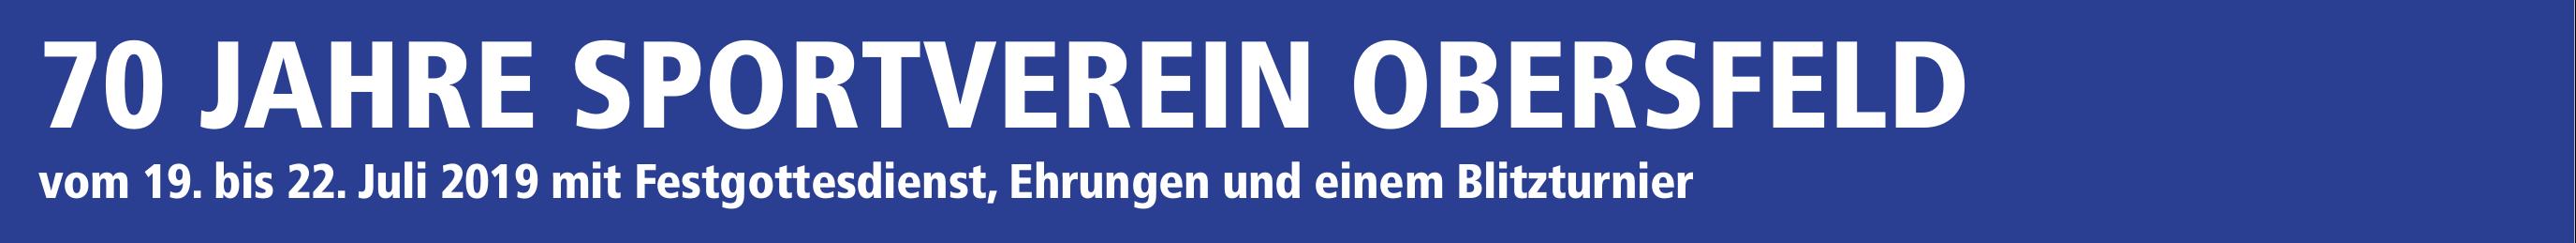 70 Jahre Sportverein Obersfeld Image 1